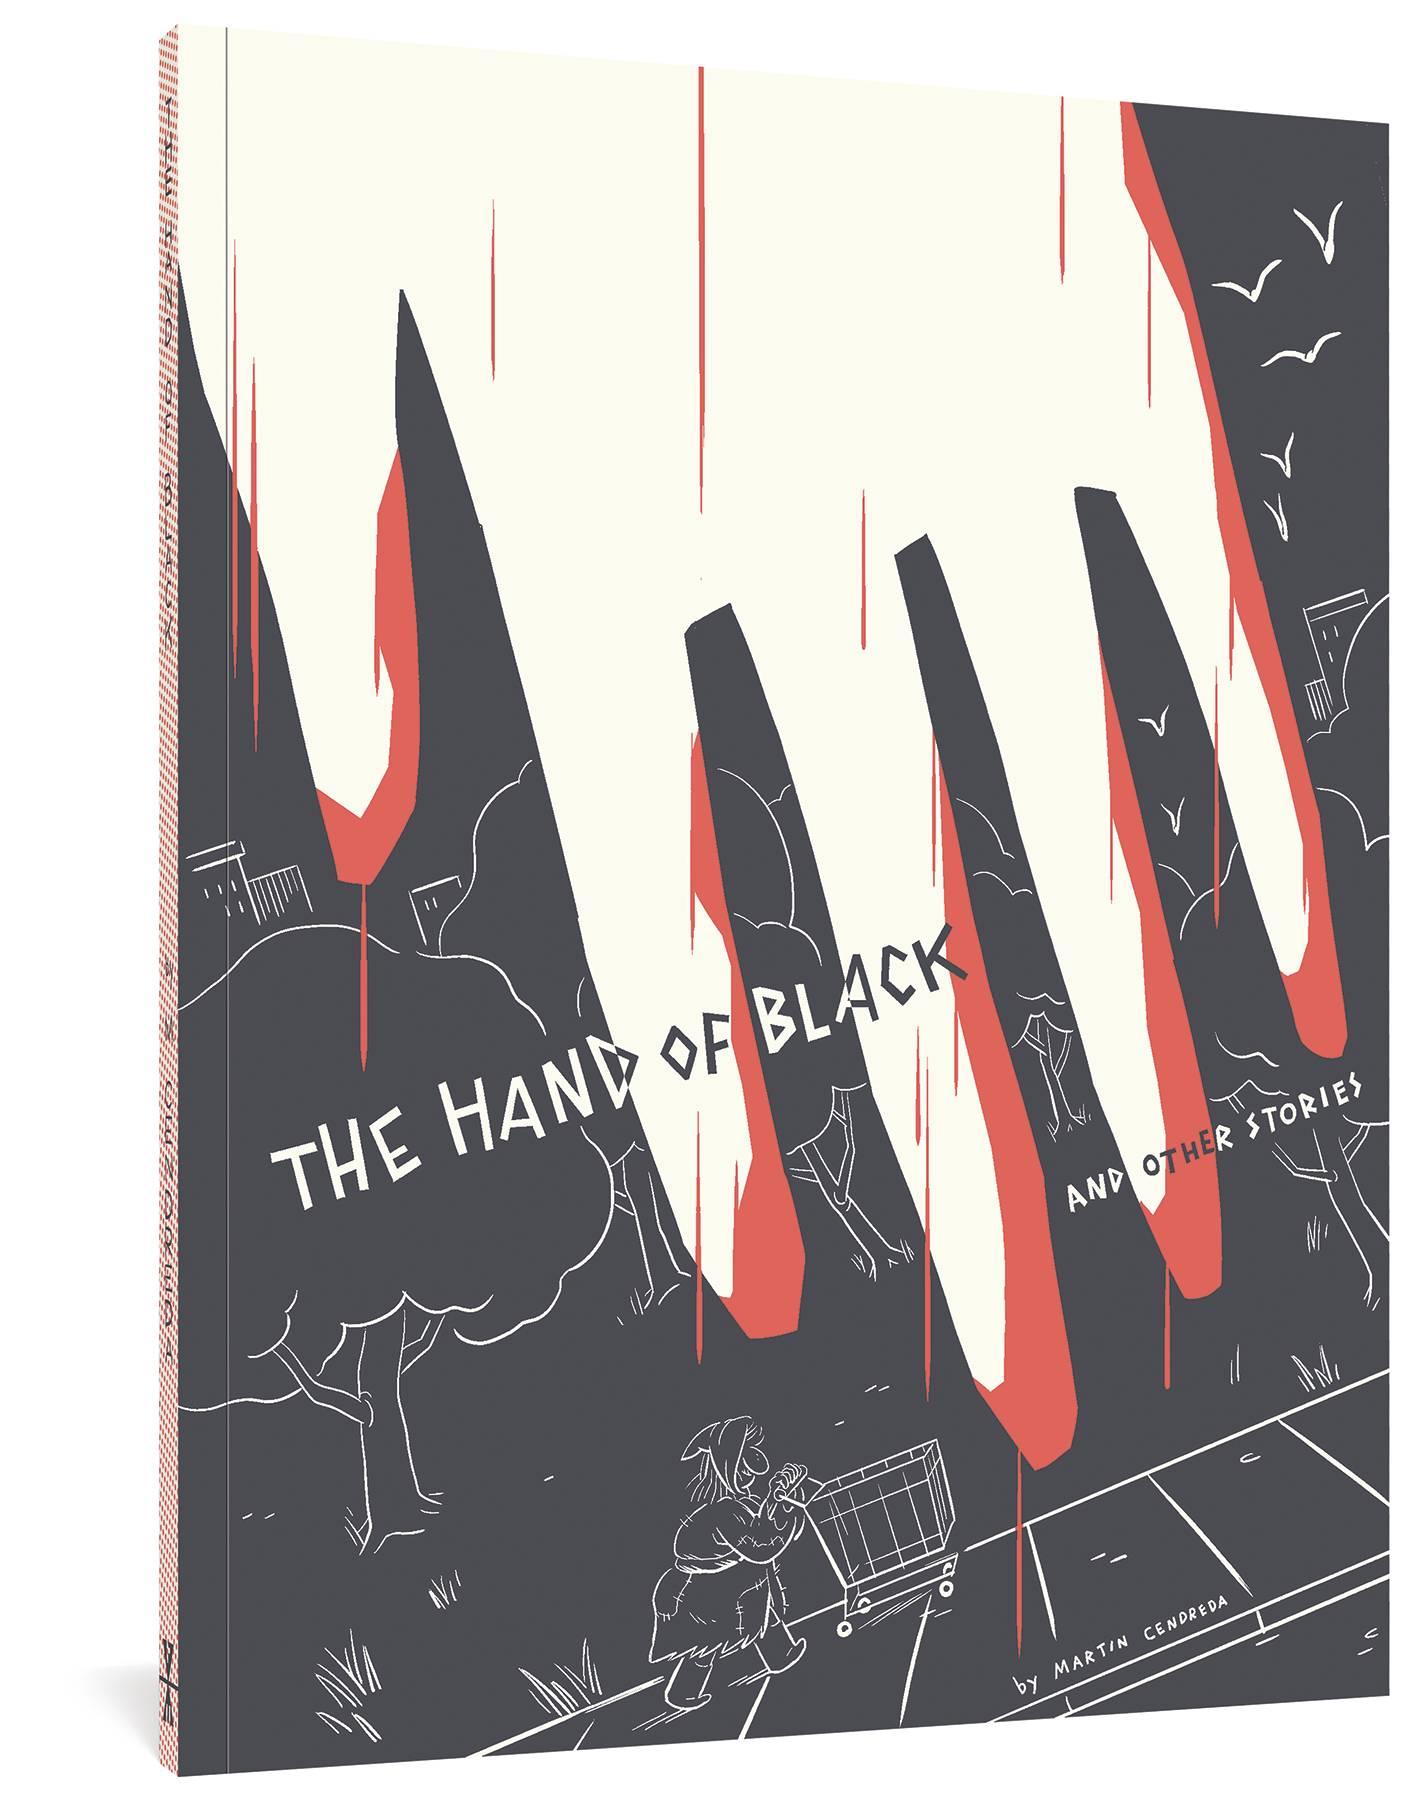 FANTAGRAPHICS UNDERGROUND HAND OF BLACK TP